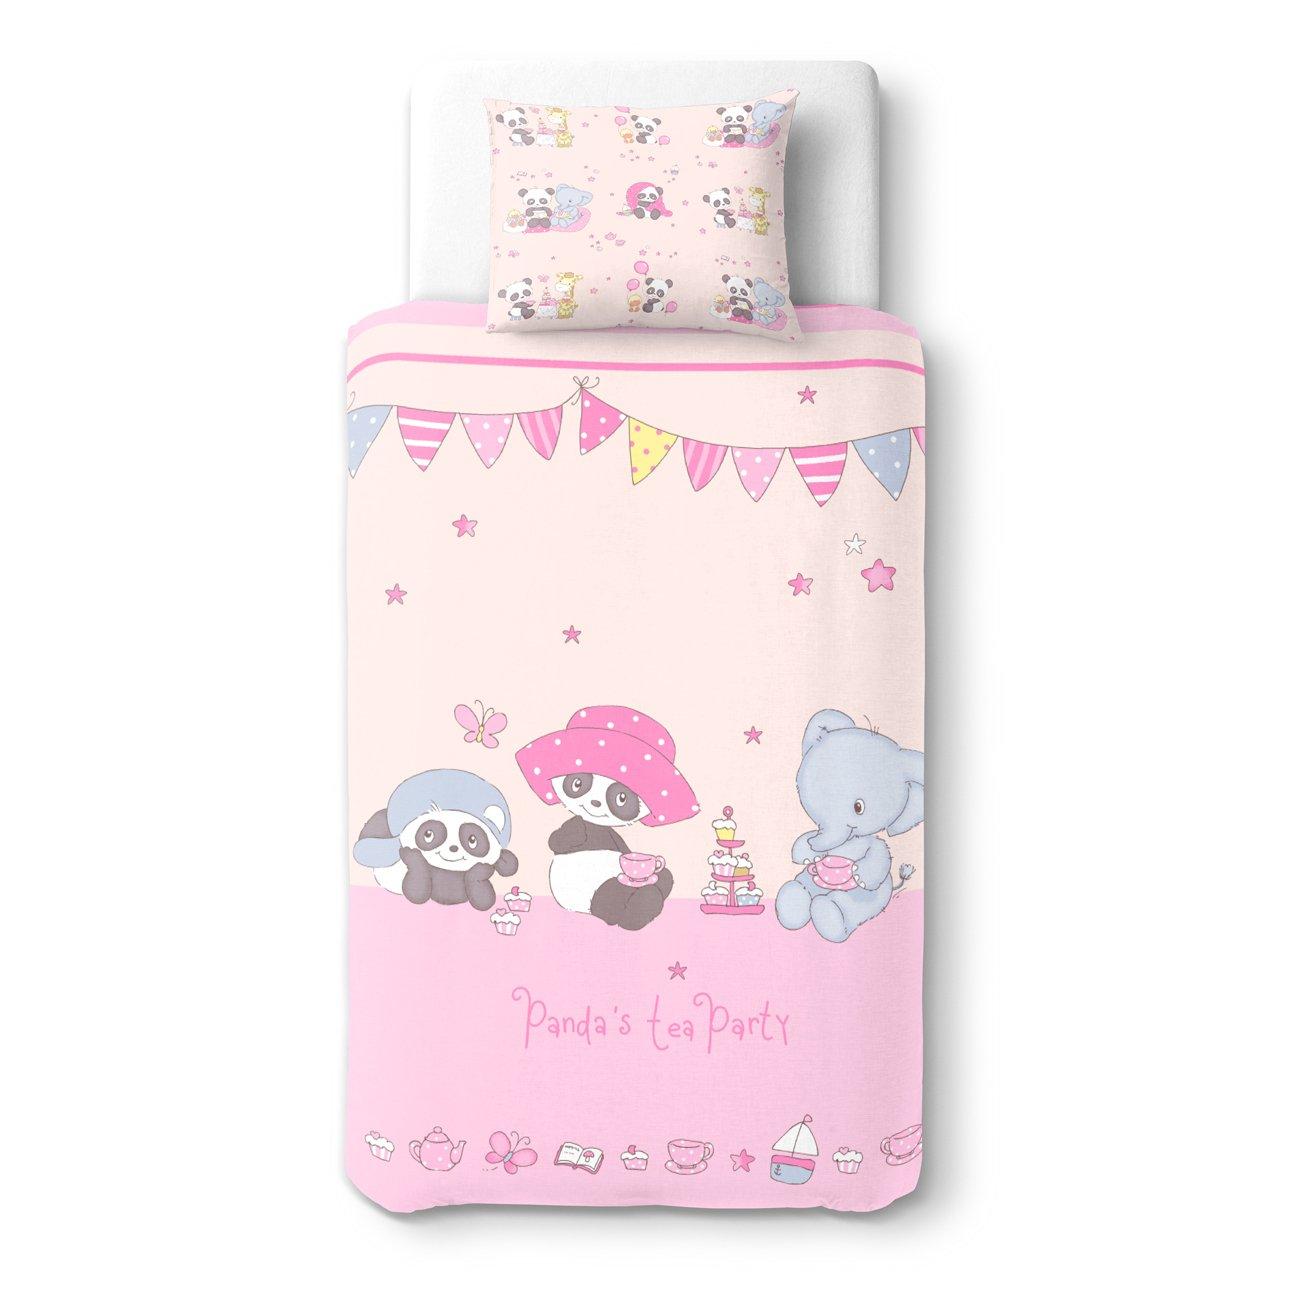 Baby Panda's Tea Party - SoulBedroom 100% Cotton Bed Set (Duvet Cover 39''x 55'' cm & Pillow Case 15''x 23'' cm) by SoulBedroom